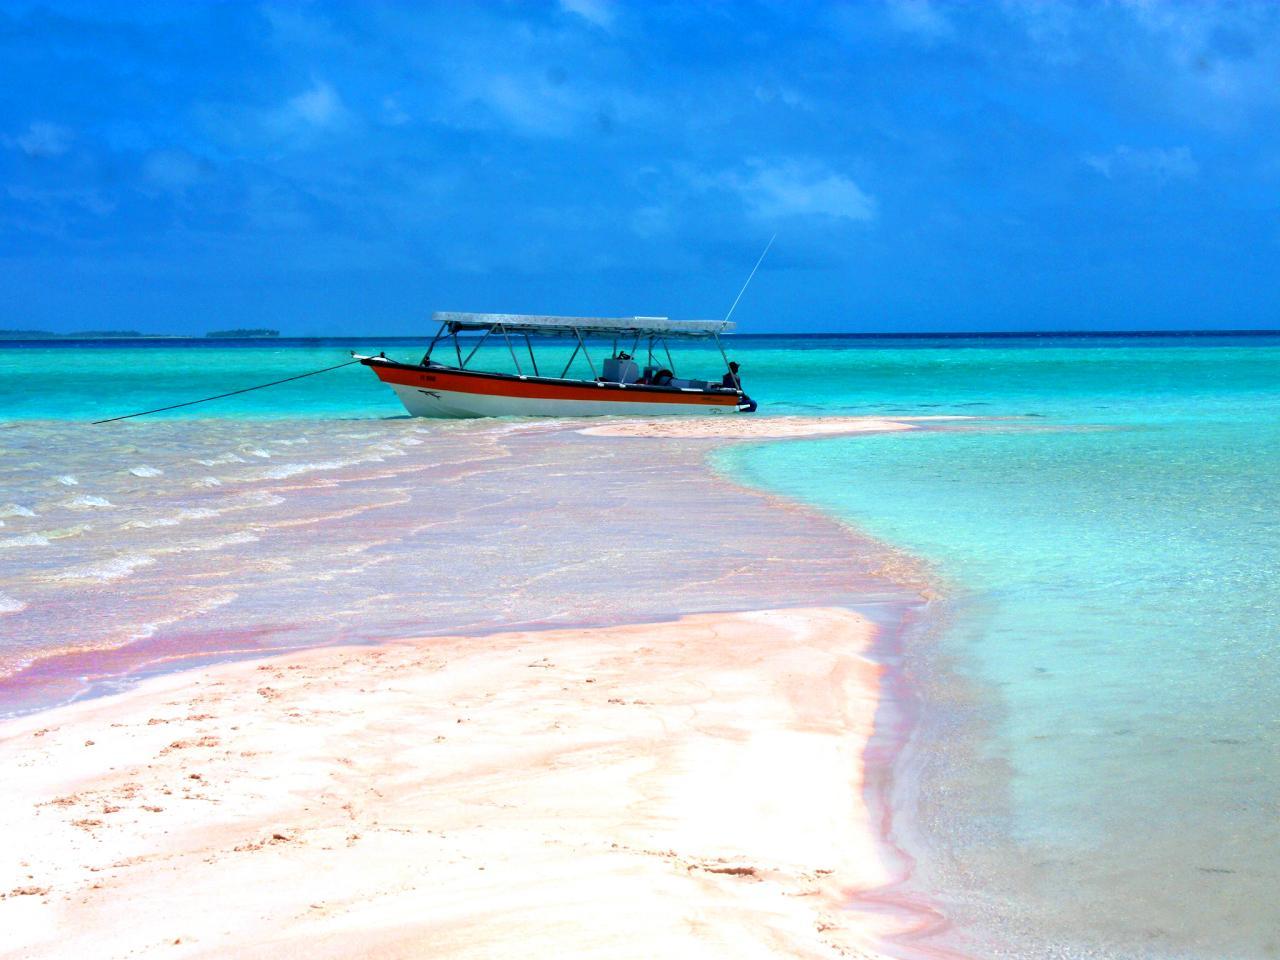 rangiroa-atoll-french-polynesia_jpg_rend_tccom_1280_960.jpeg